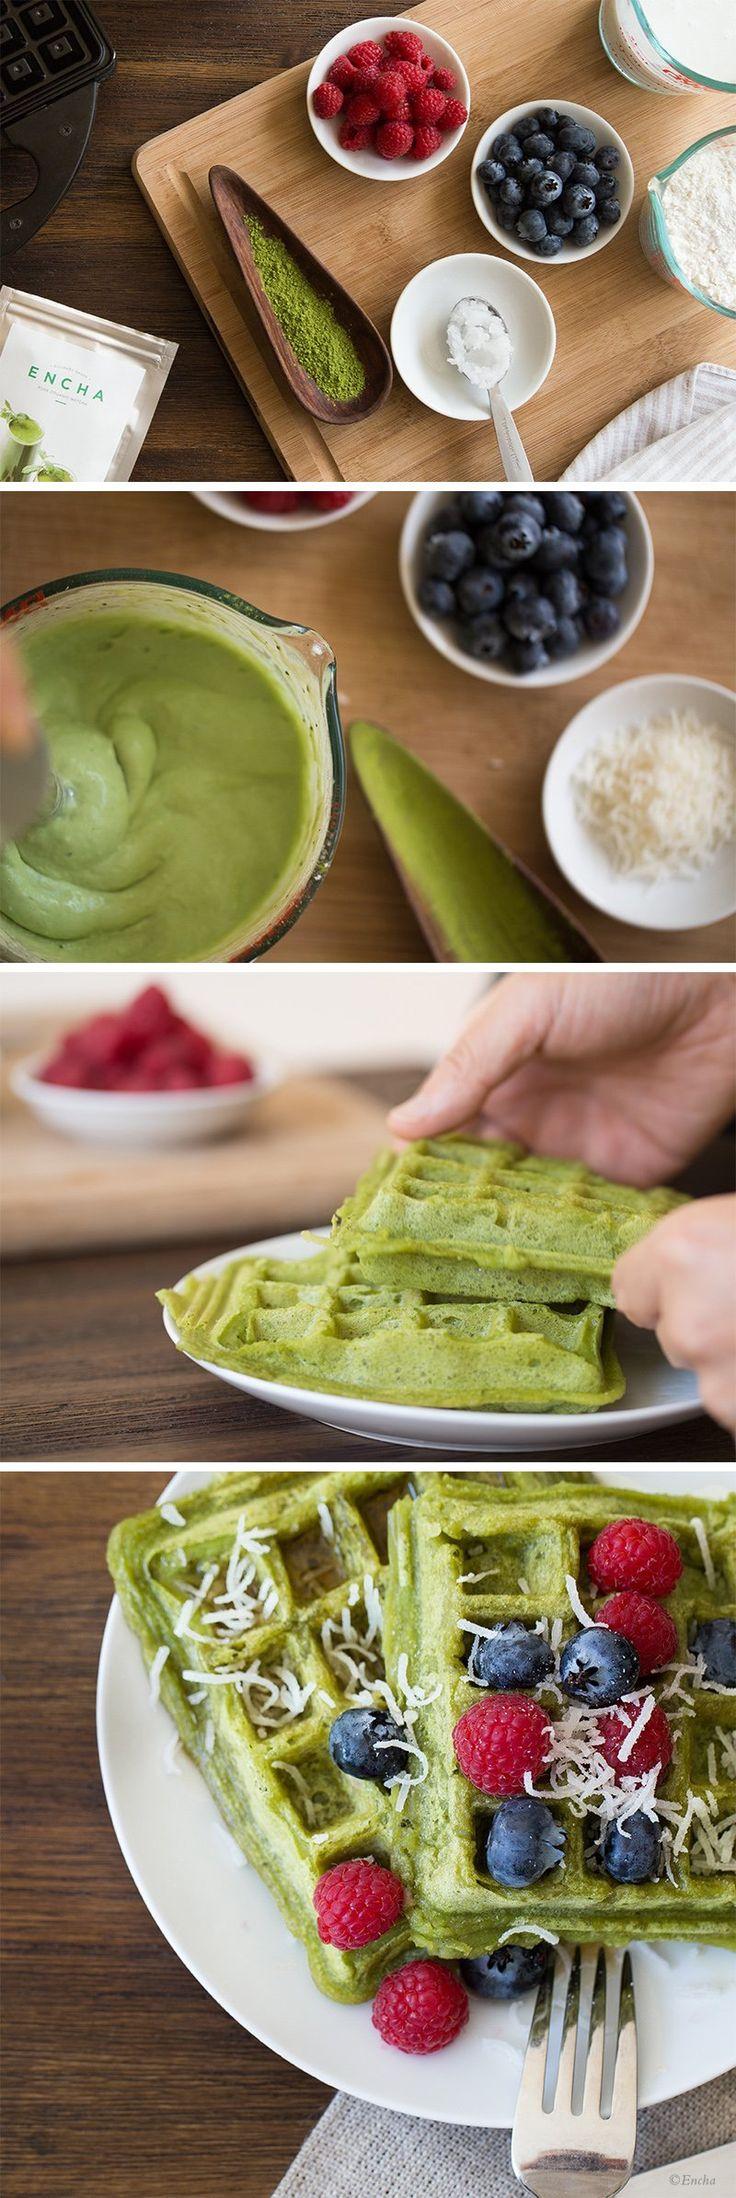 Matcha Waffle Recipe: Vegan Gluten-Free Coconut Encha Organic Matcha Waffle